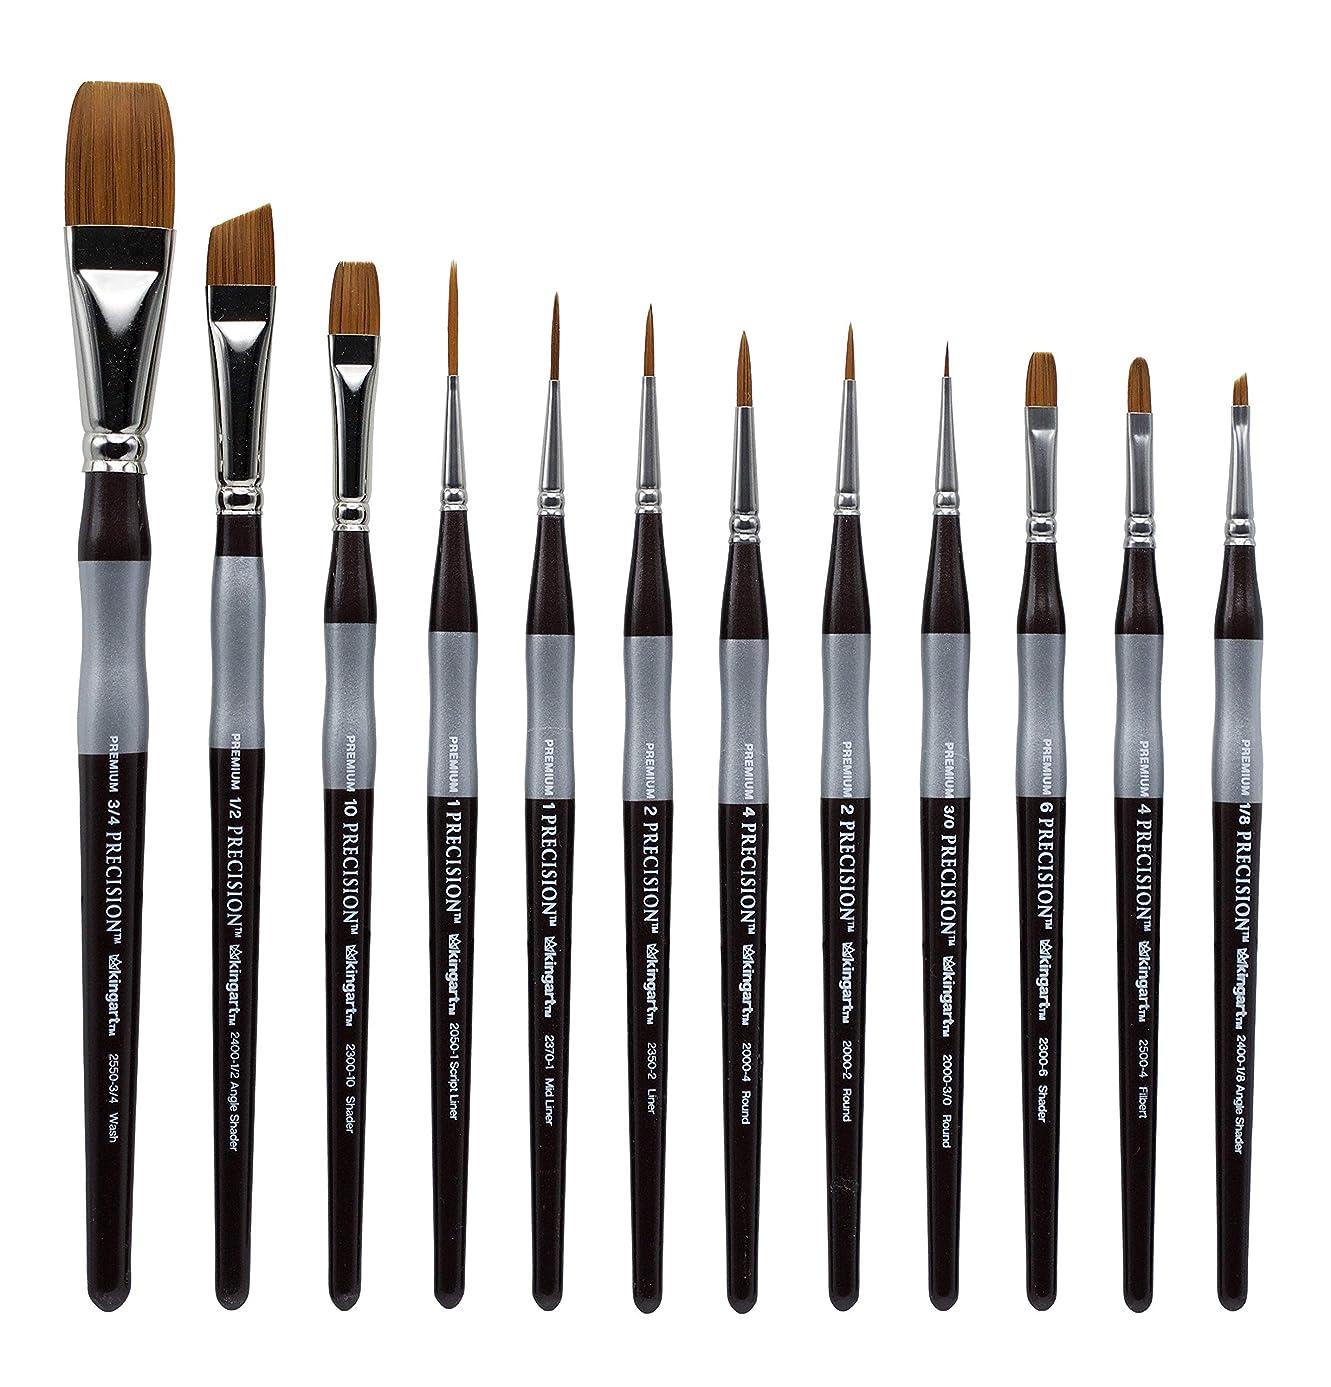 KINGART 1070B Precision Golden and Amber TAKLON Set of 12 Paint Brush Set, Black/Silver